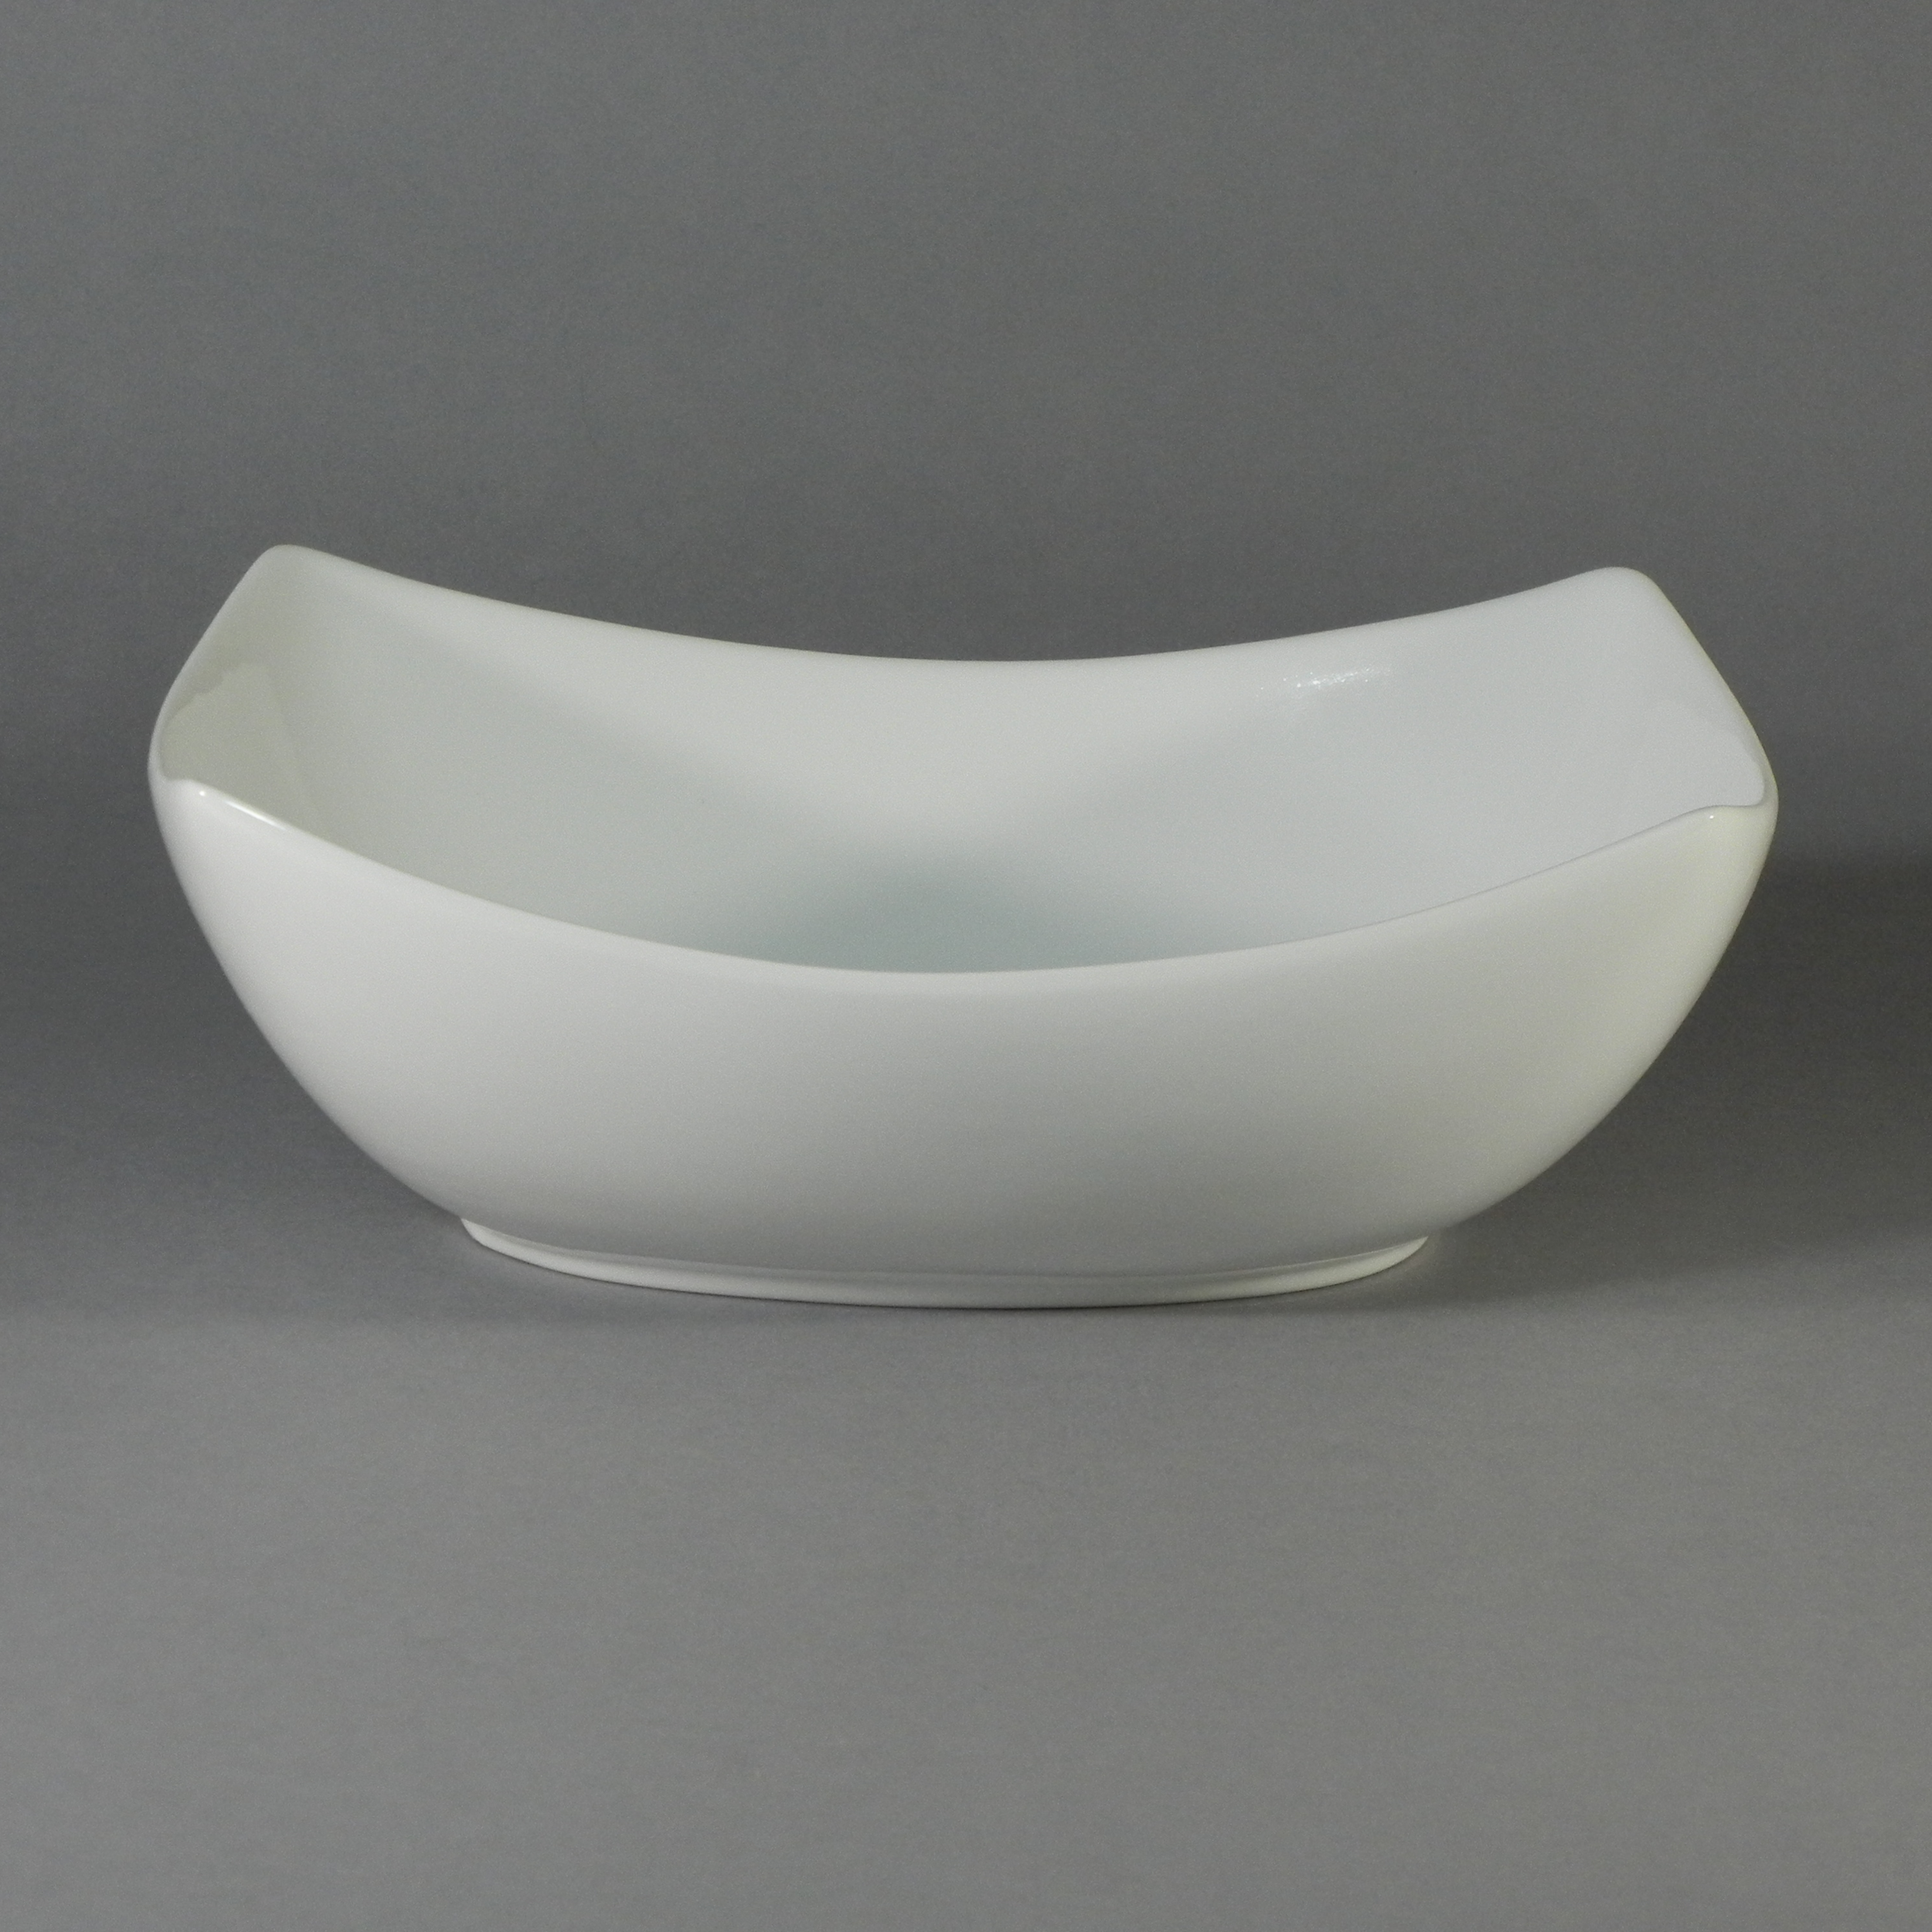 "Porcelain Rectangular Bowl - Y (10.5""x8"")"